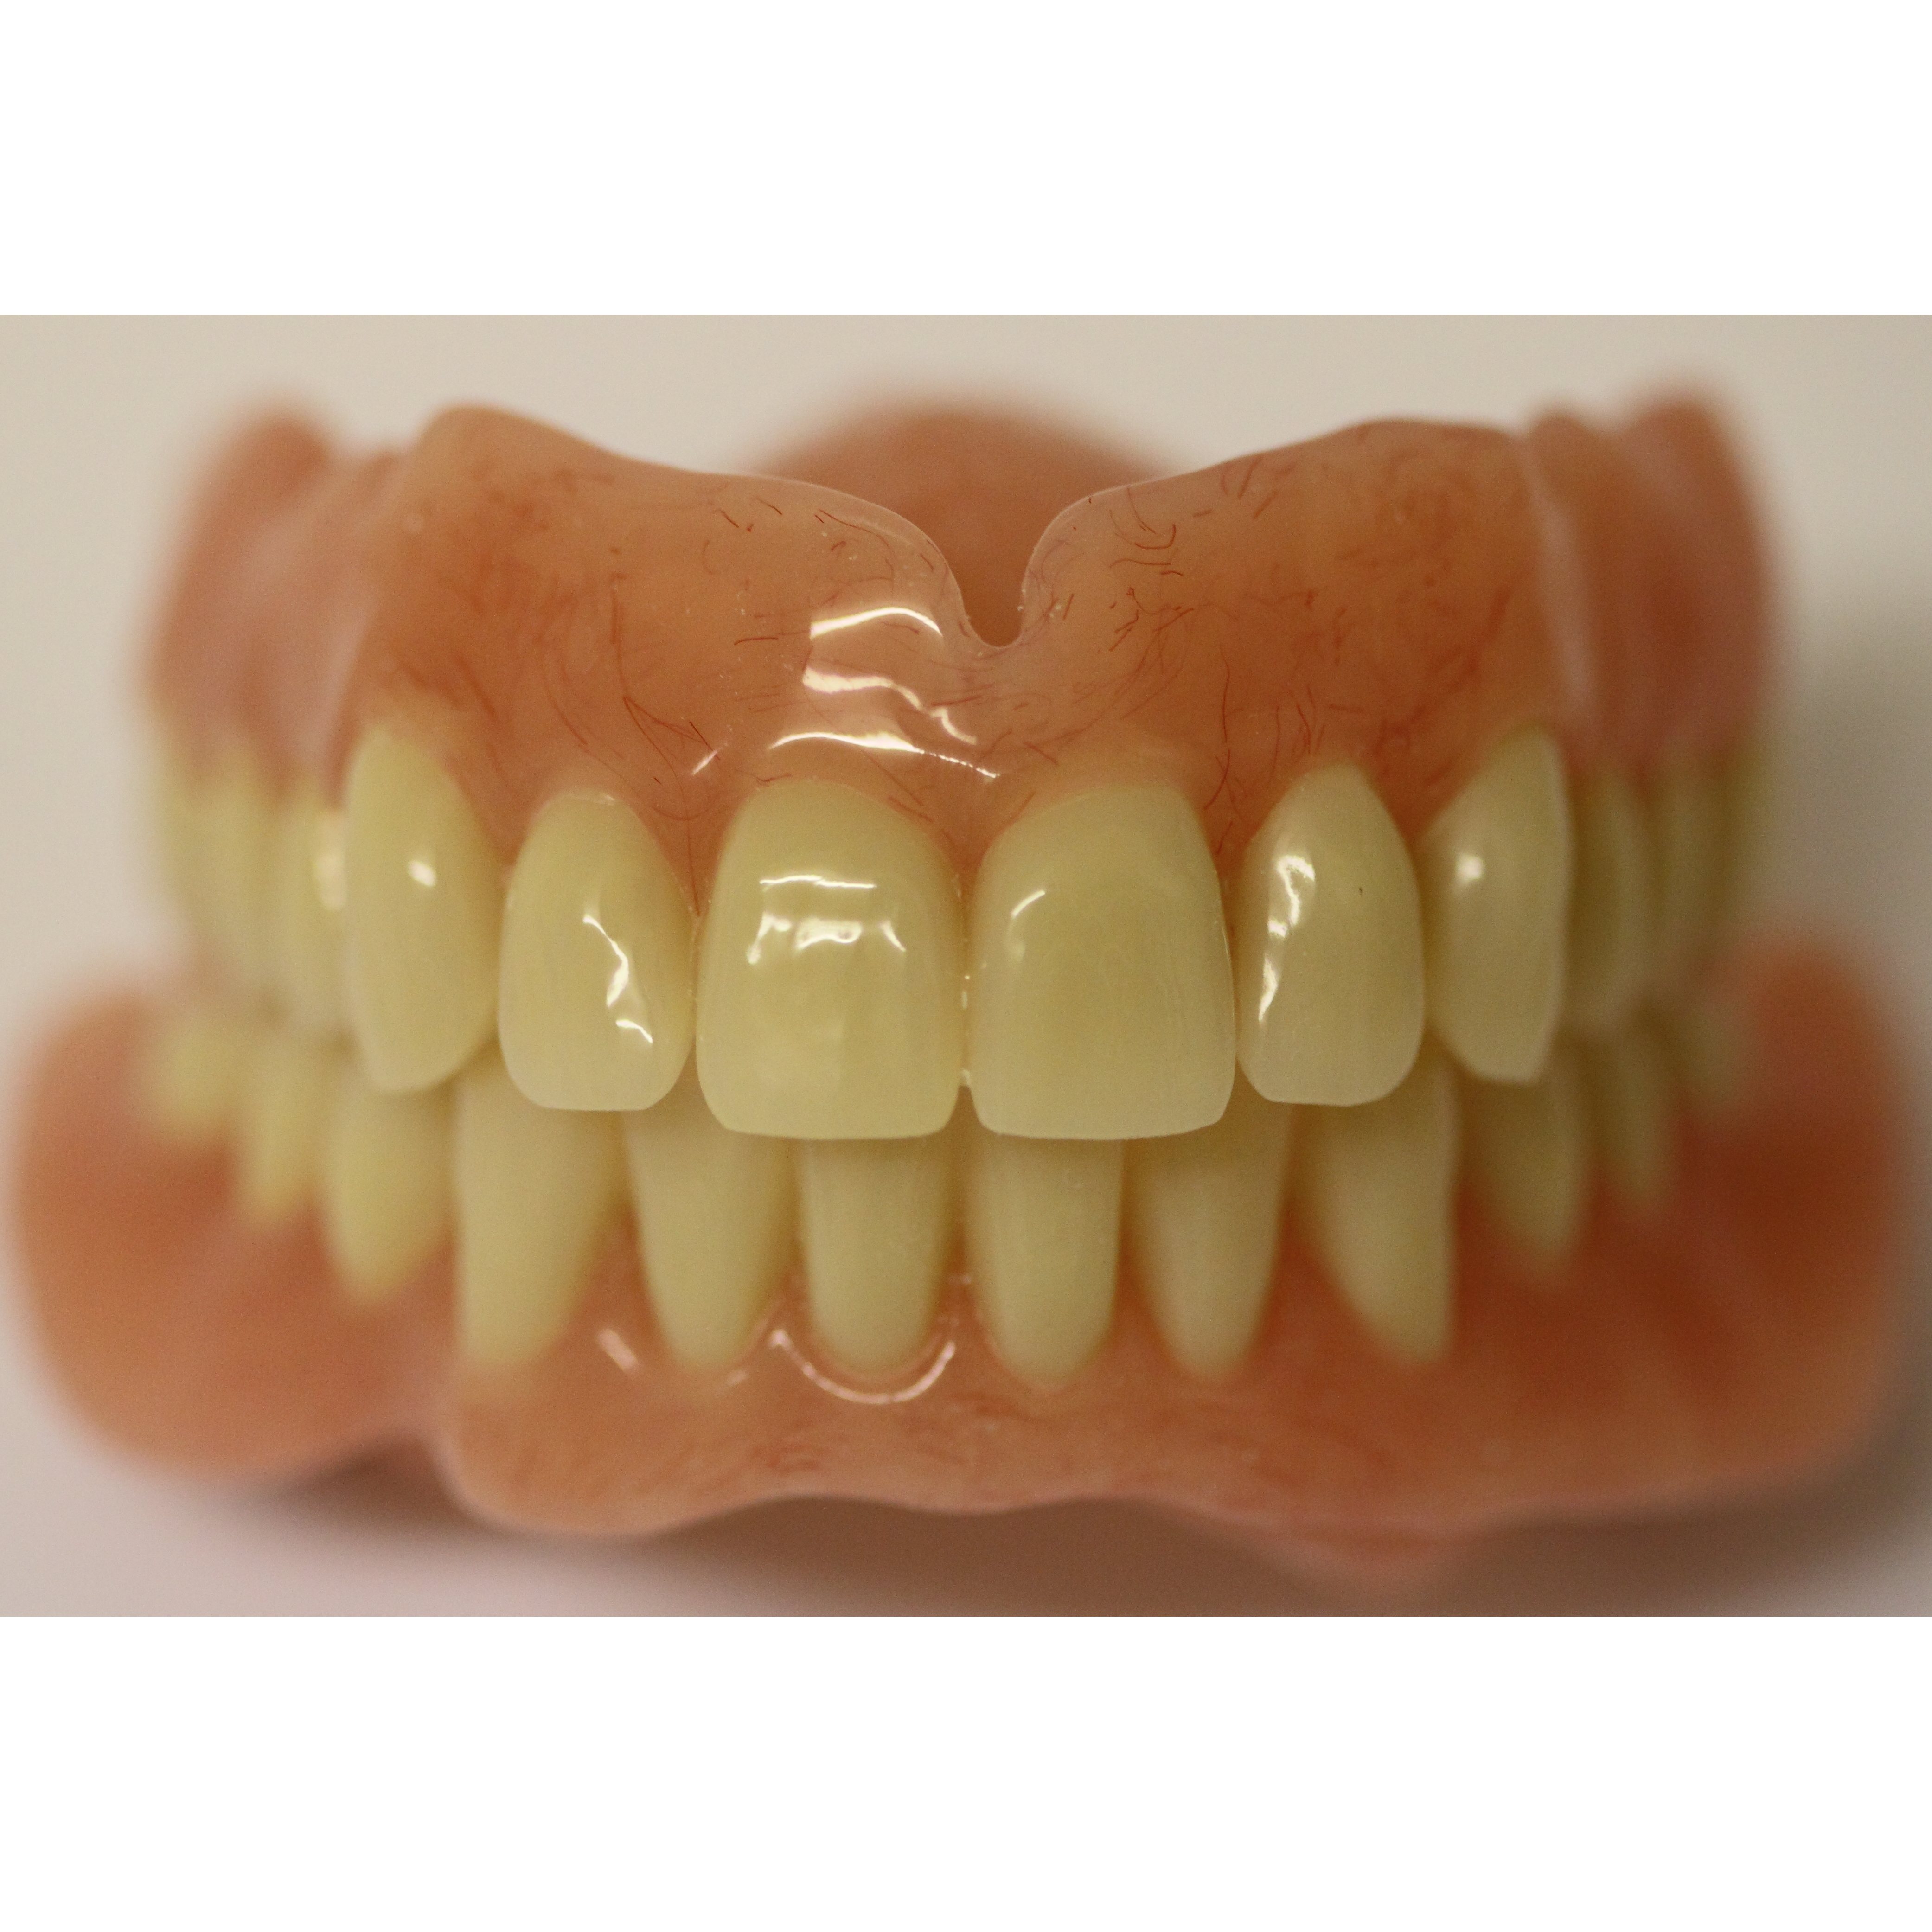 Southend Dental Laboratory - Southend-On-Sea, Essex SS1 1NF - 01702 335121 | ShowMeLocal.com